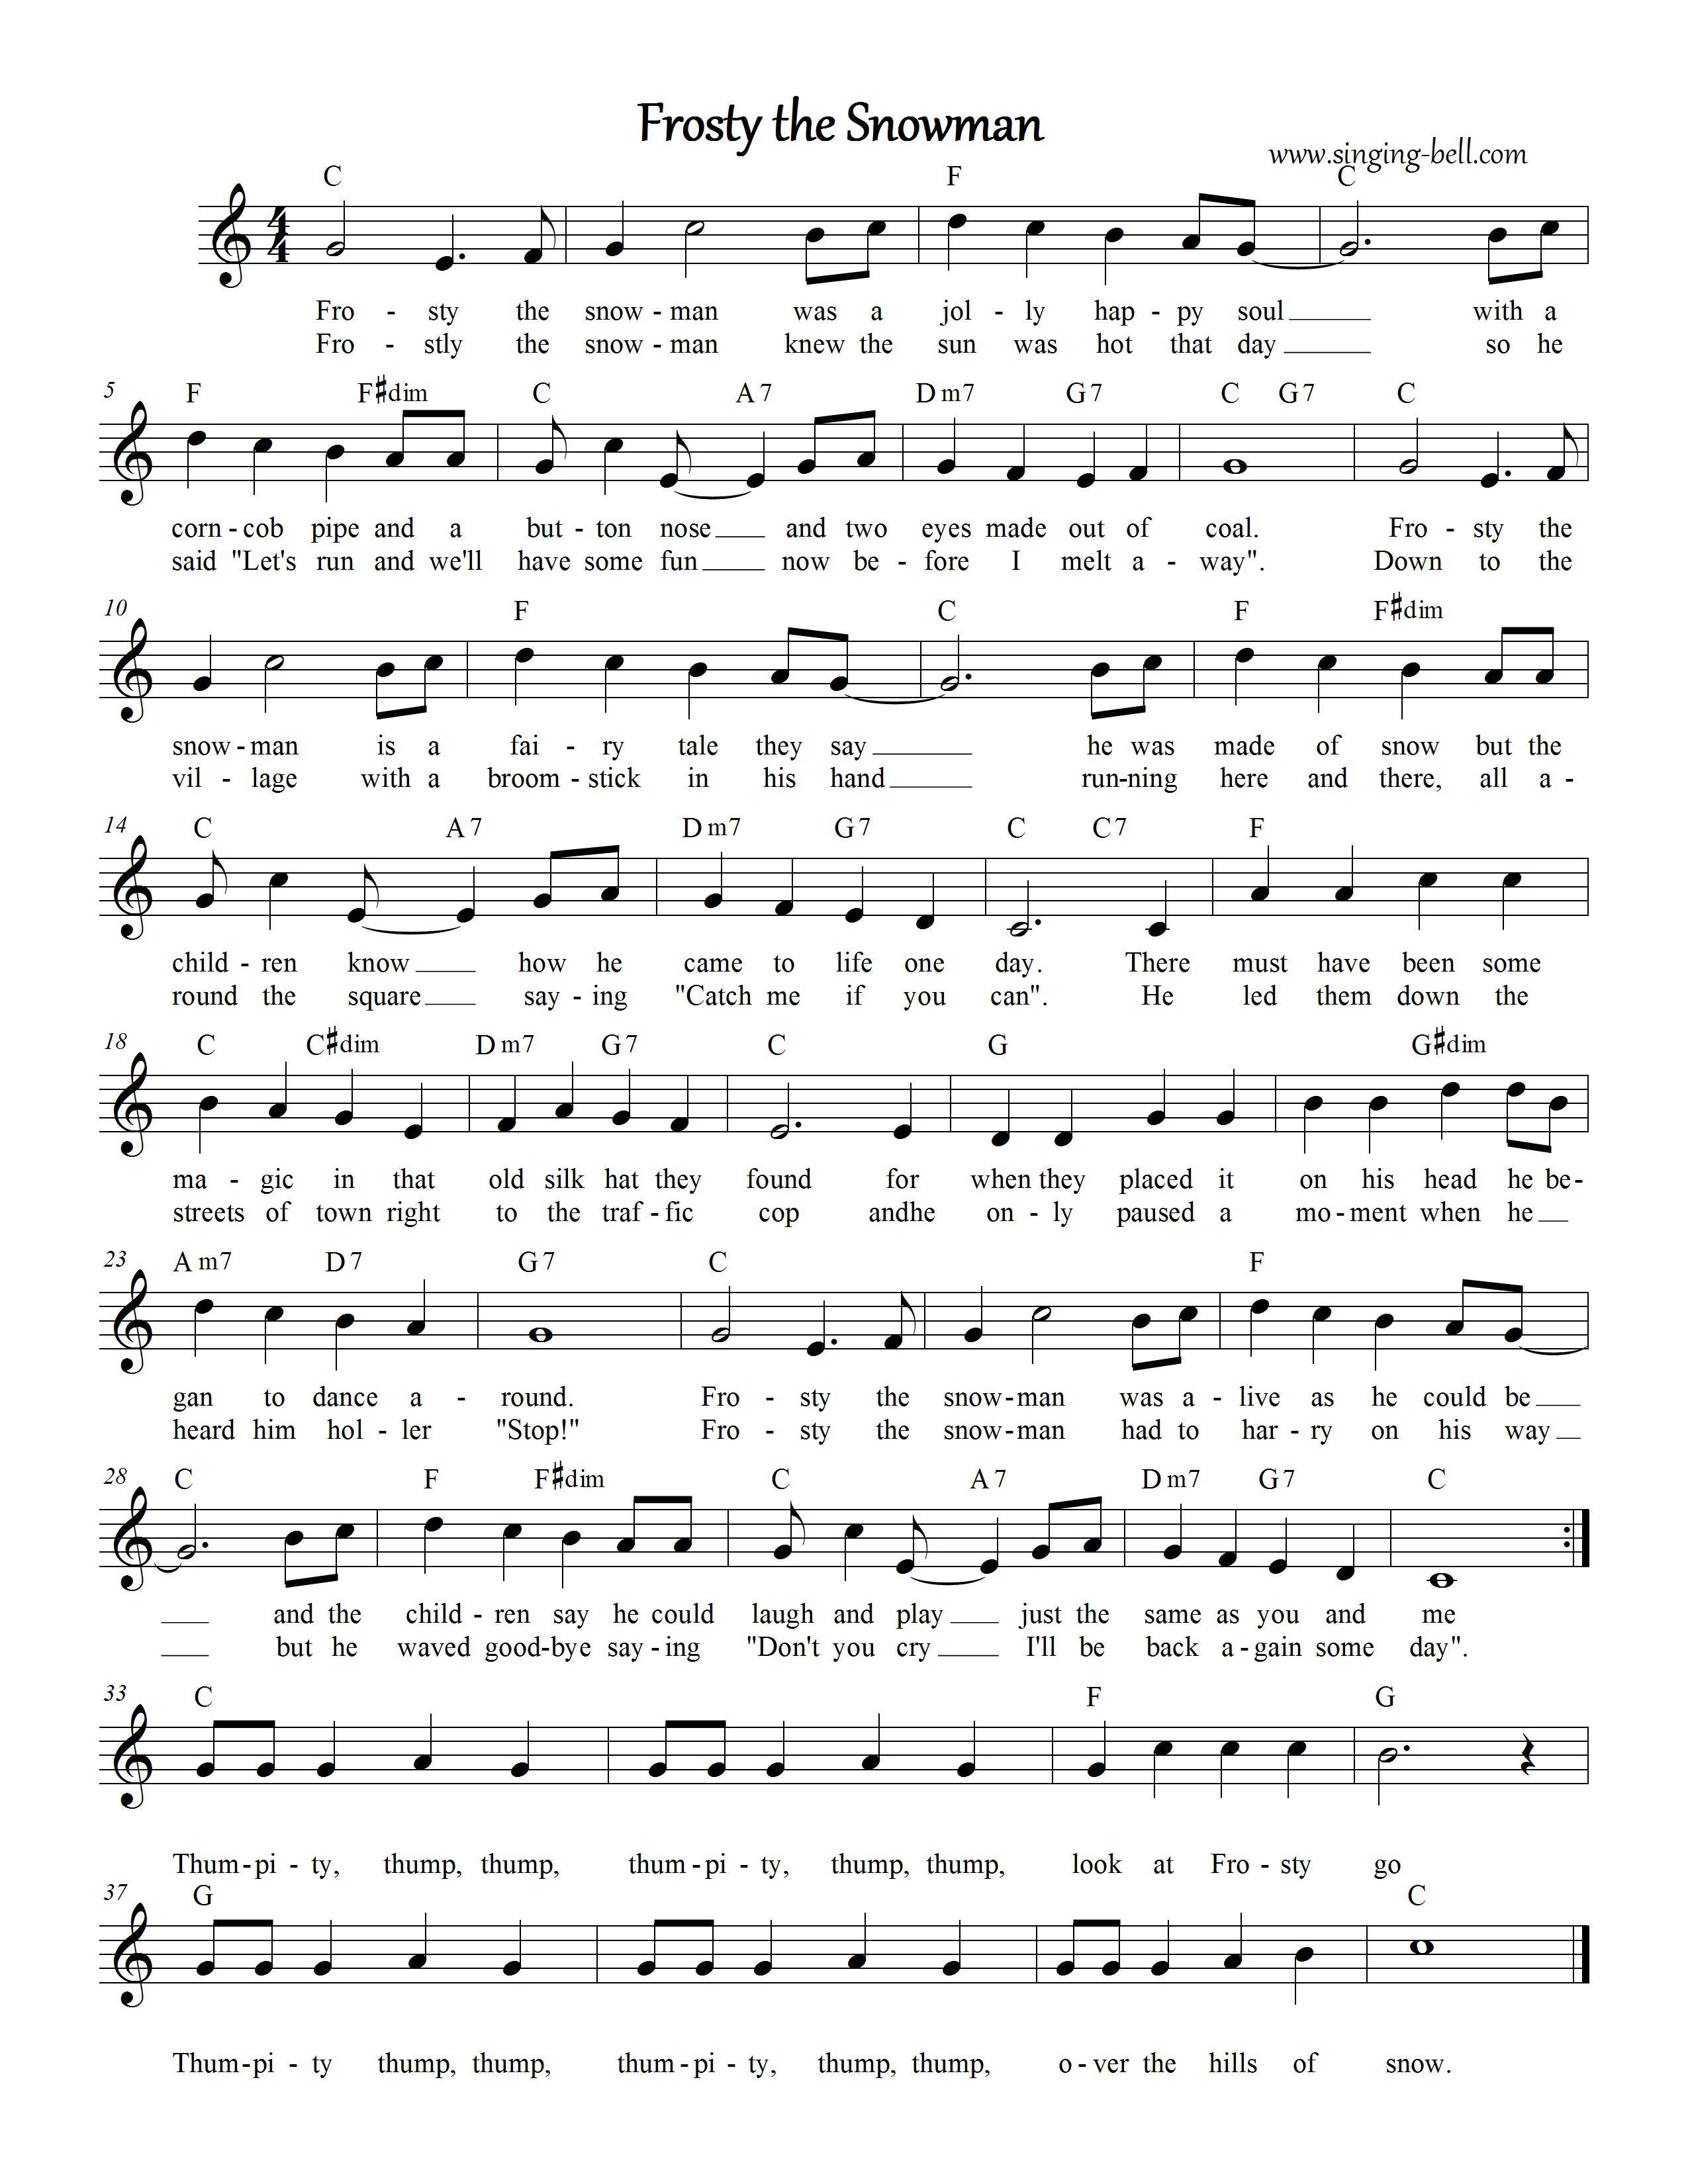 Frosty The Snowman | Free Christmas Carols Karaoke - Free Printable Lyrics To Christmas Carols